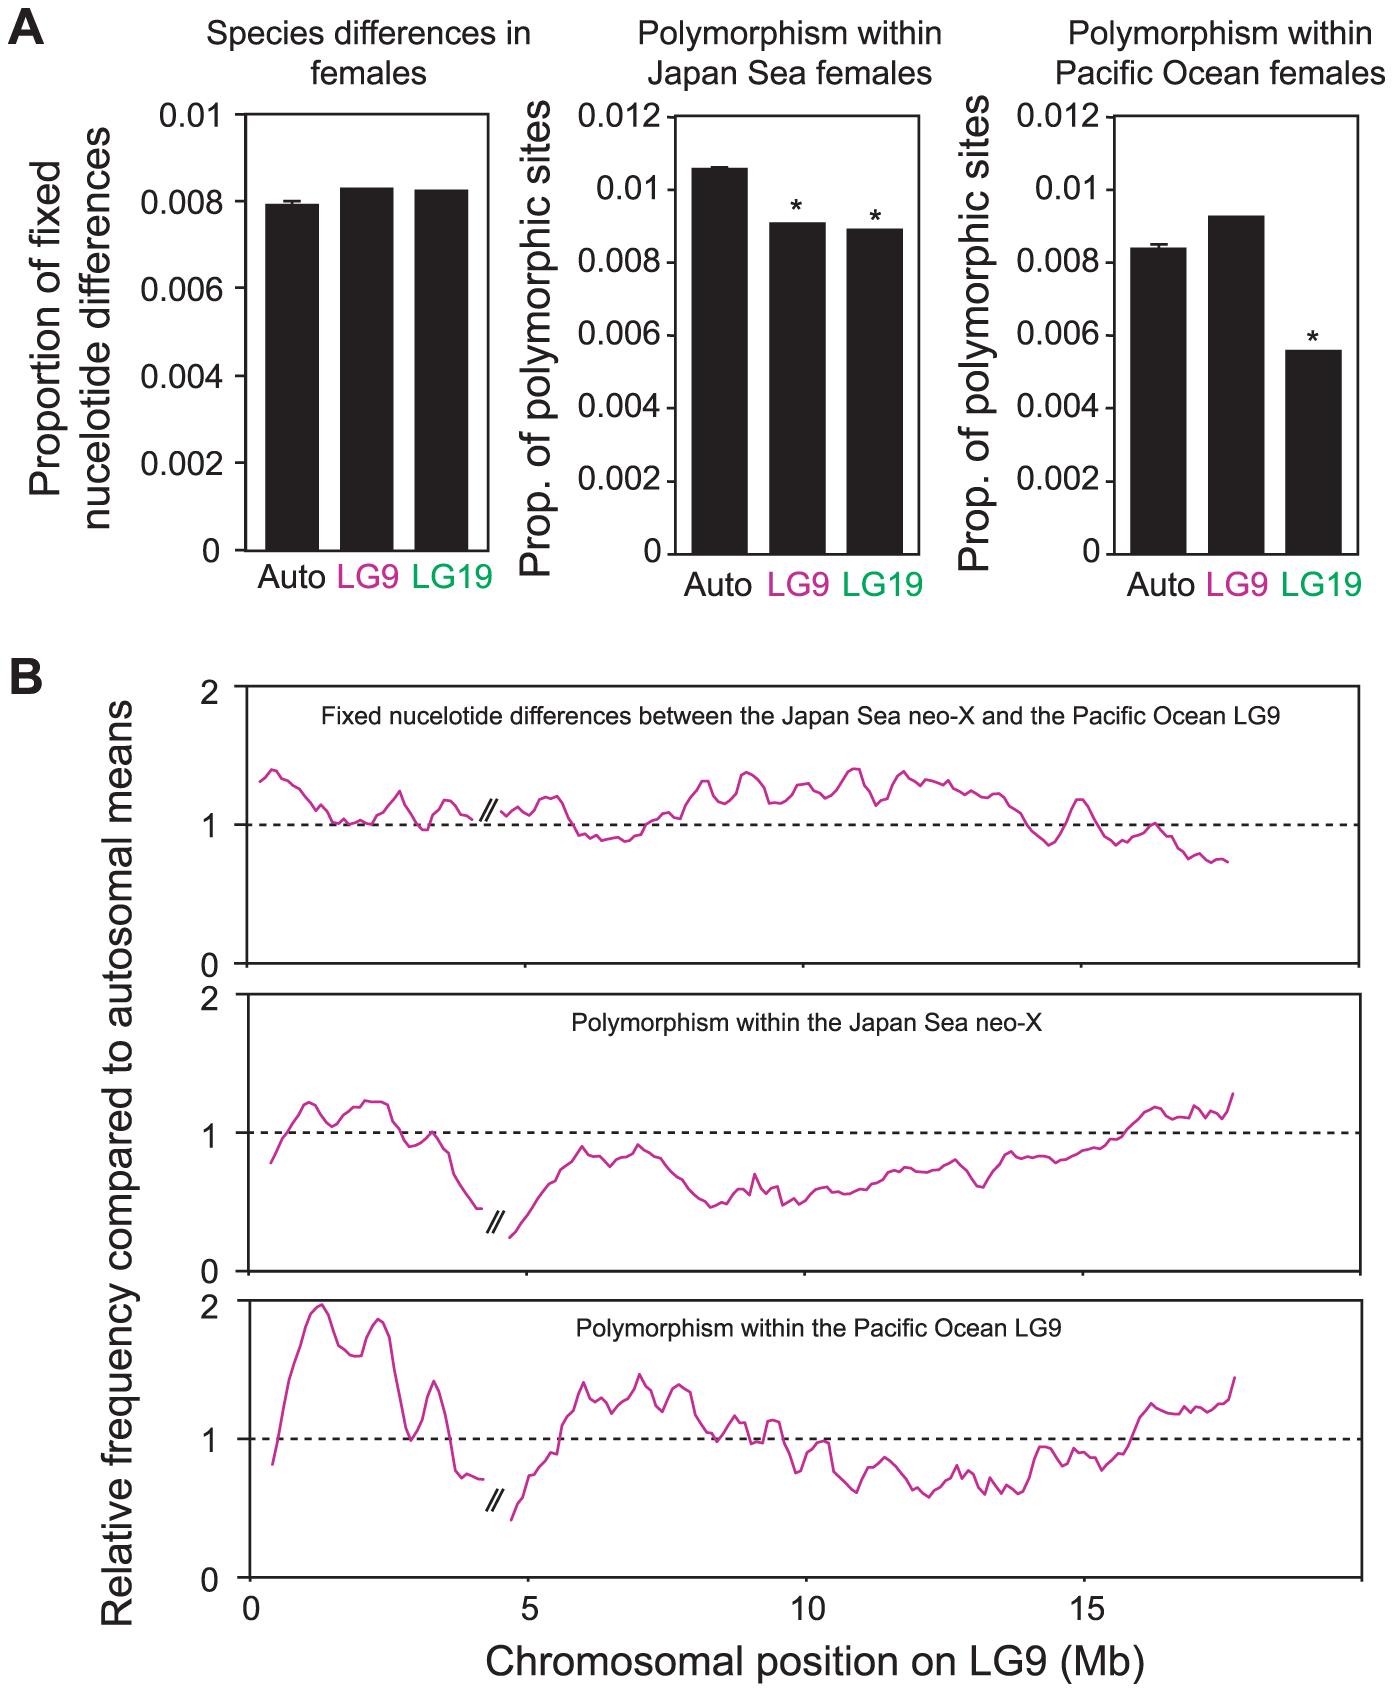 Genomic divergence between the Japan Sea and the Pacific Ocean species.